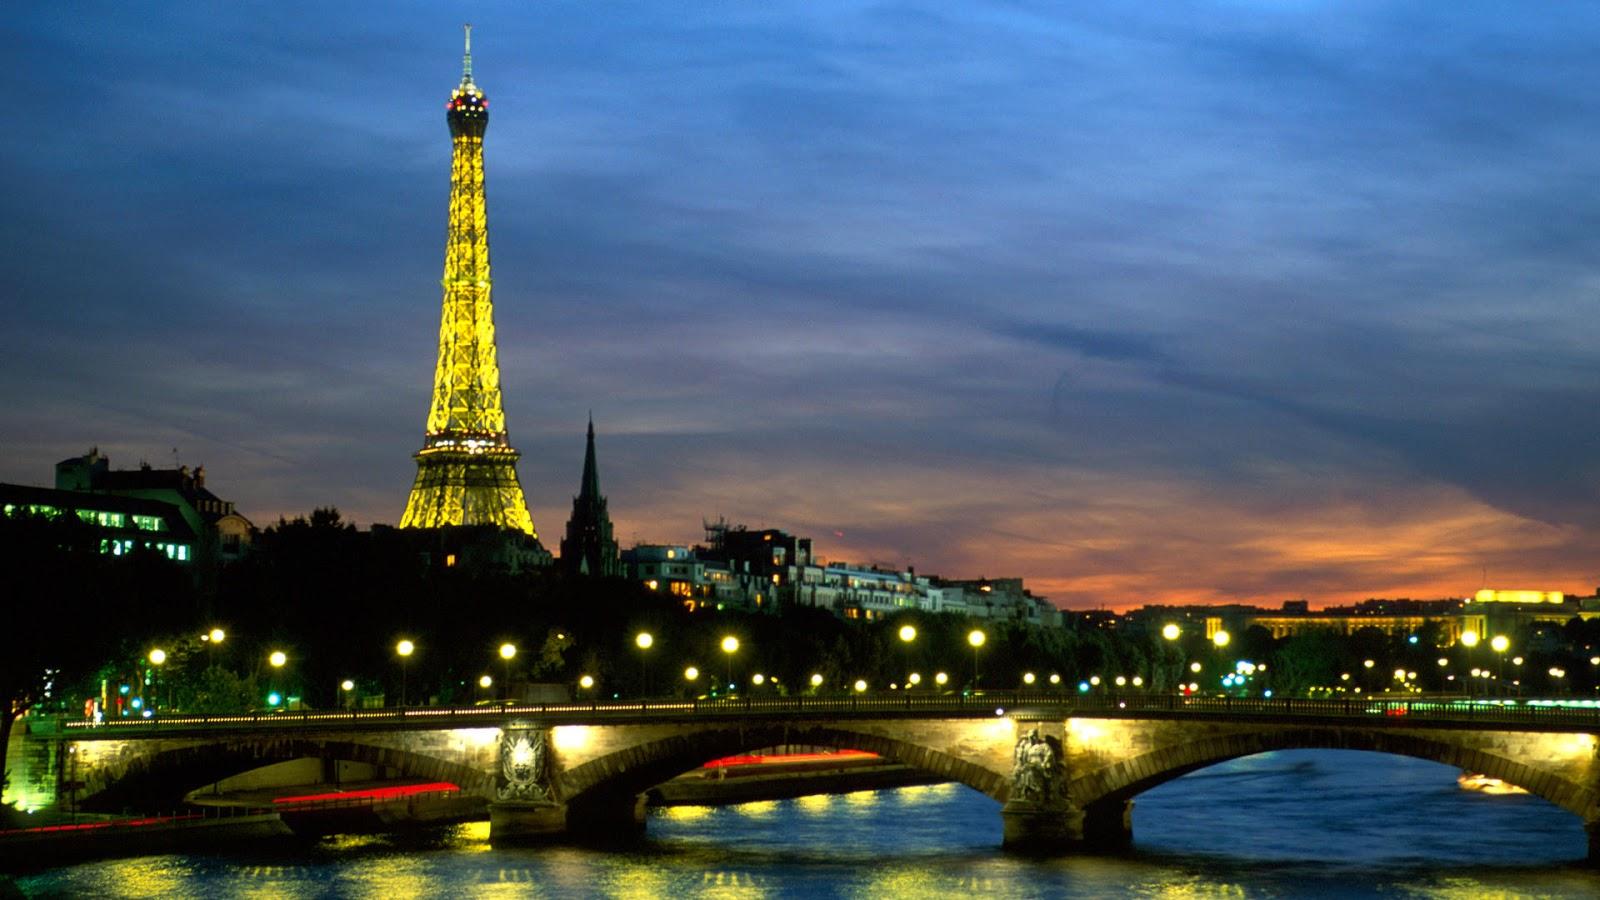 10 Wallpaper Menara Eiffel Malam Hari Keren Dan Unik Deloiz Wallpaper